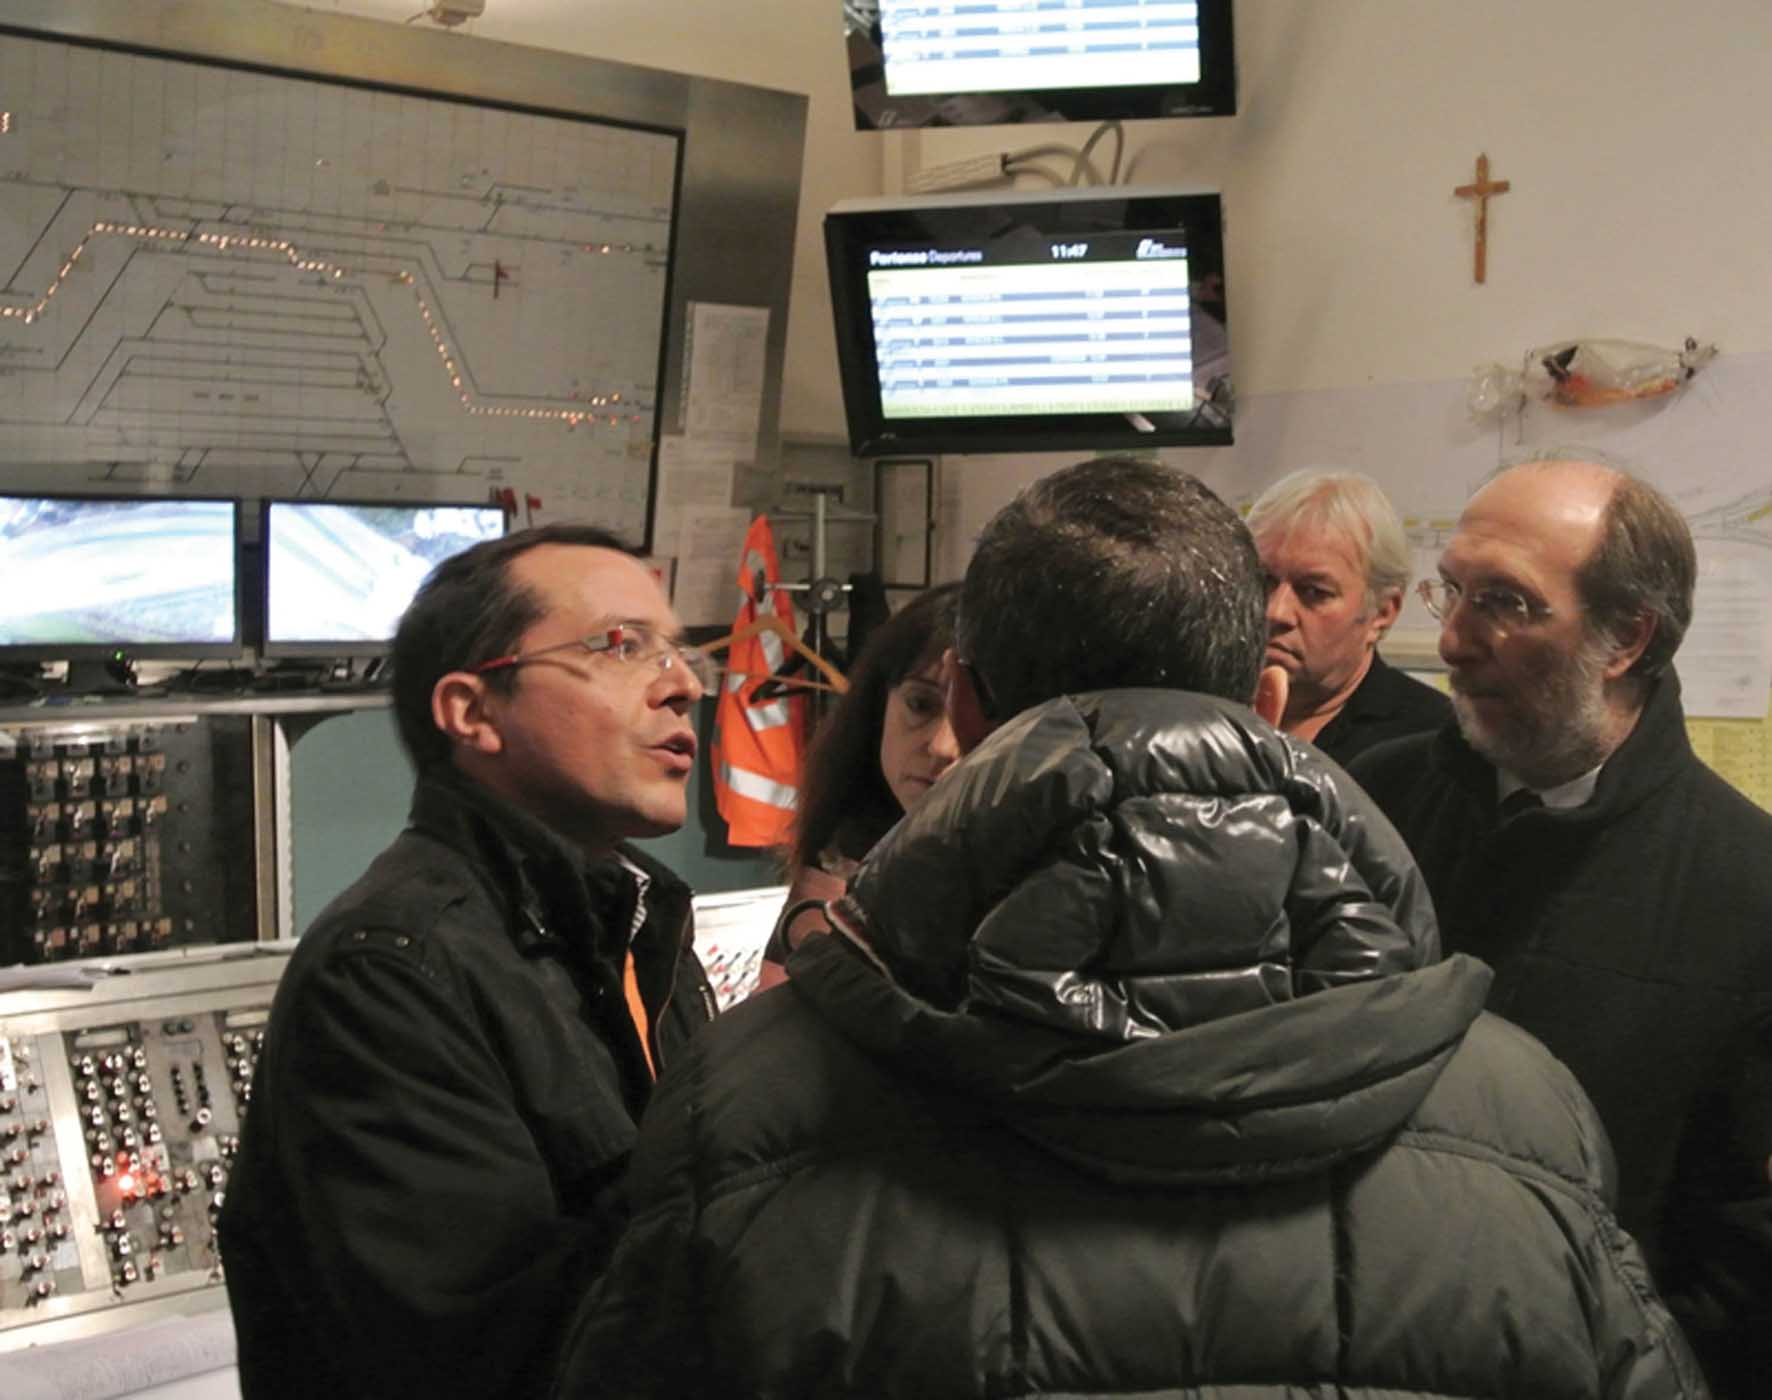 FVG attraversamento ferroviario Udine Antonio CInquemanri Riccardo Riccardi 1